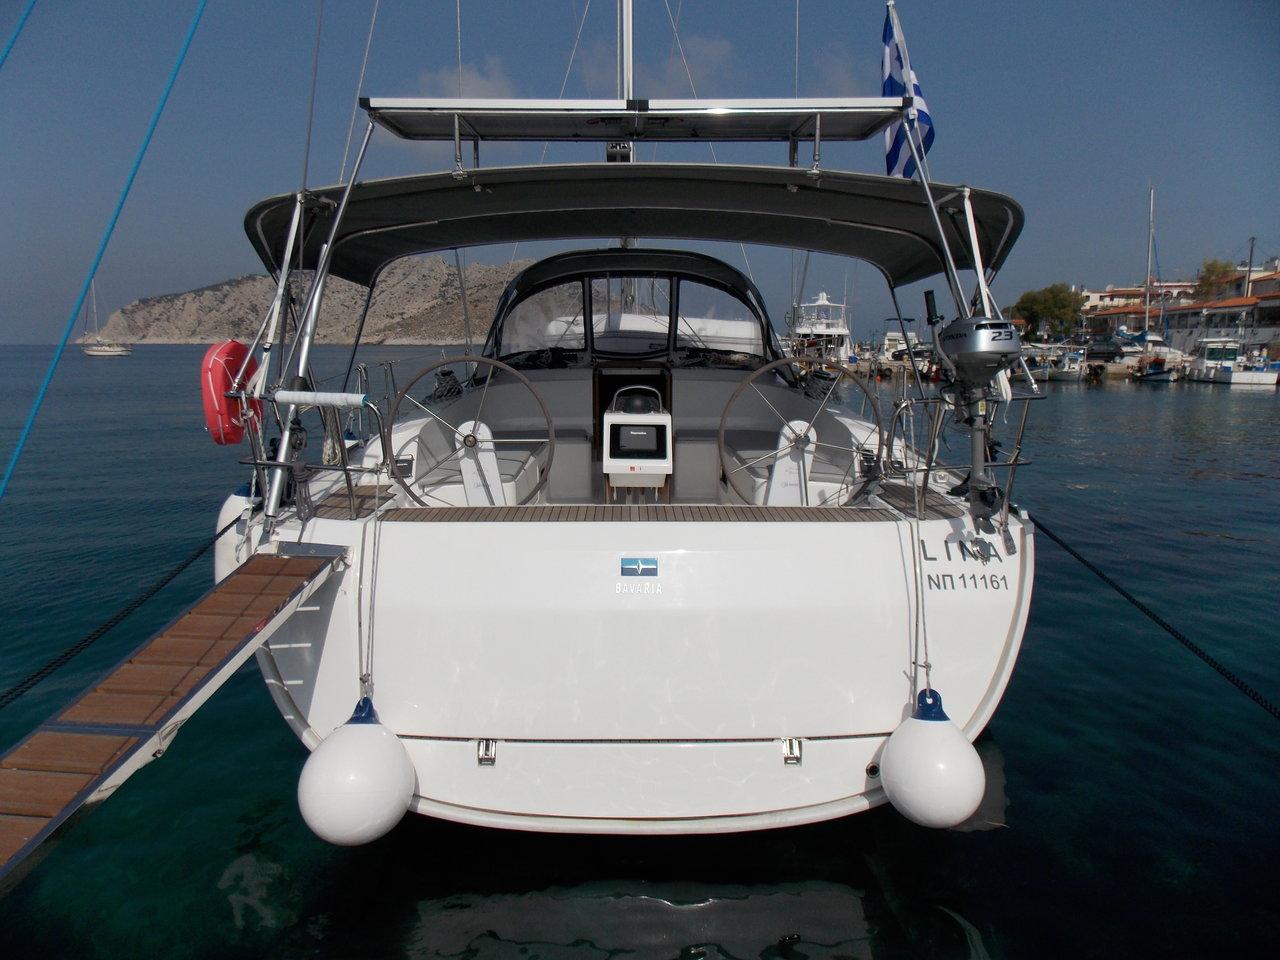 Bavaria Cruiser 46 - 4 cab. (2015) - Athens, Marina Alimos (Kalamaki)